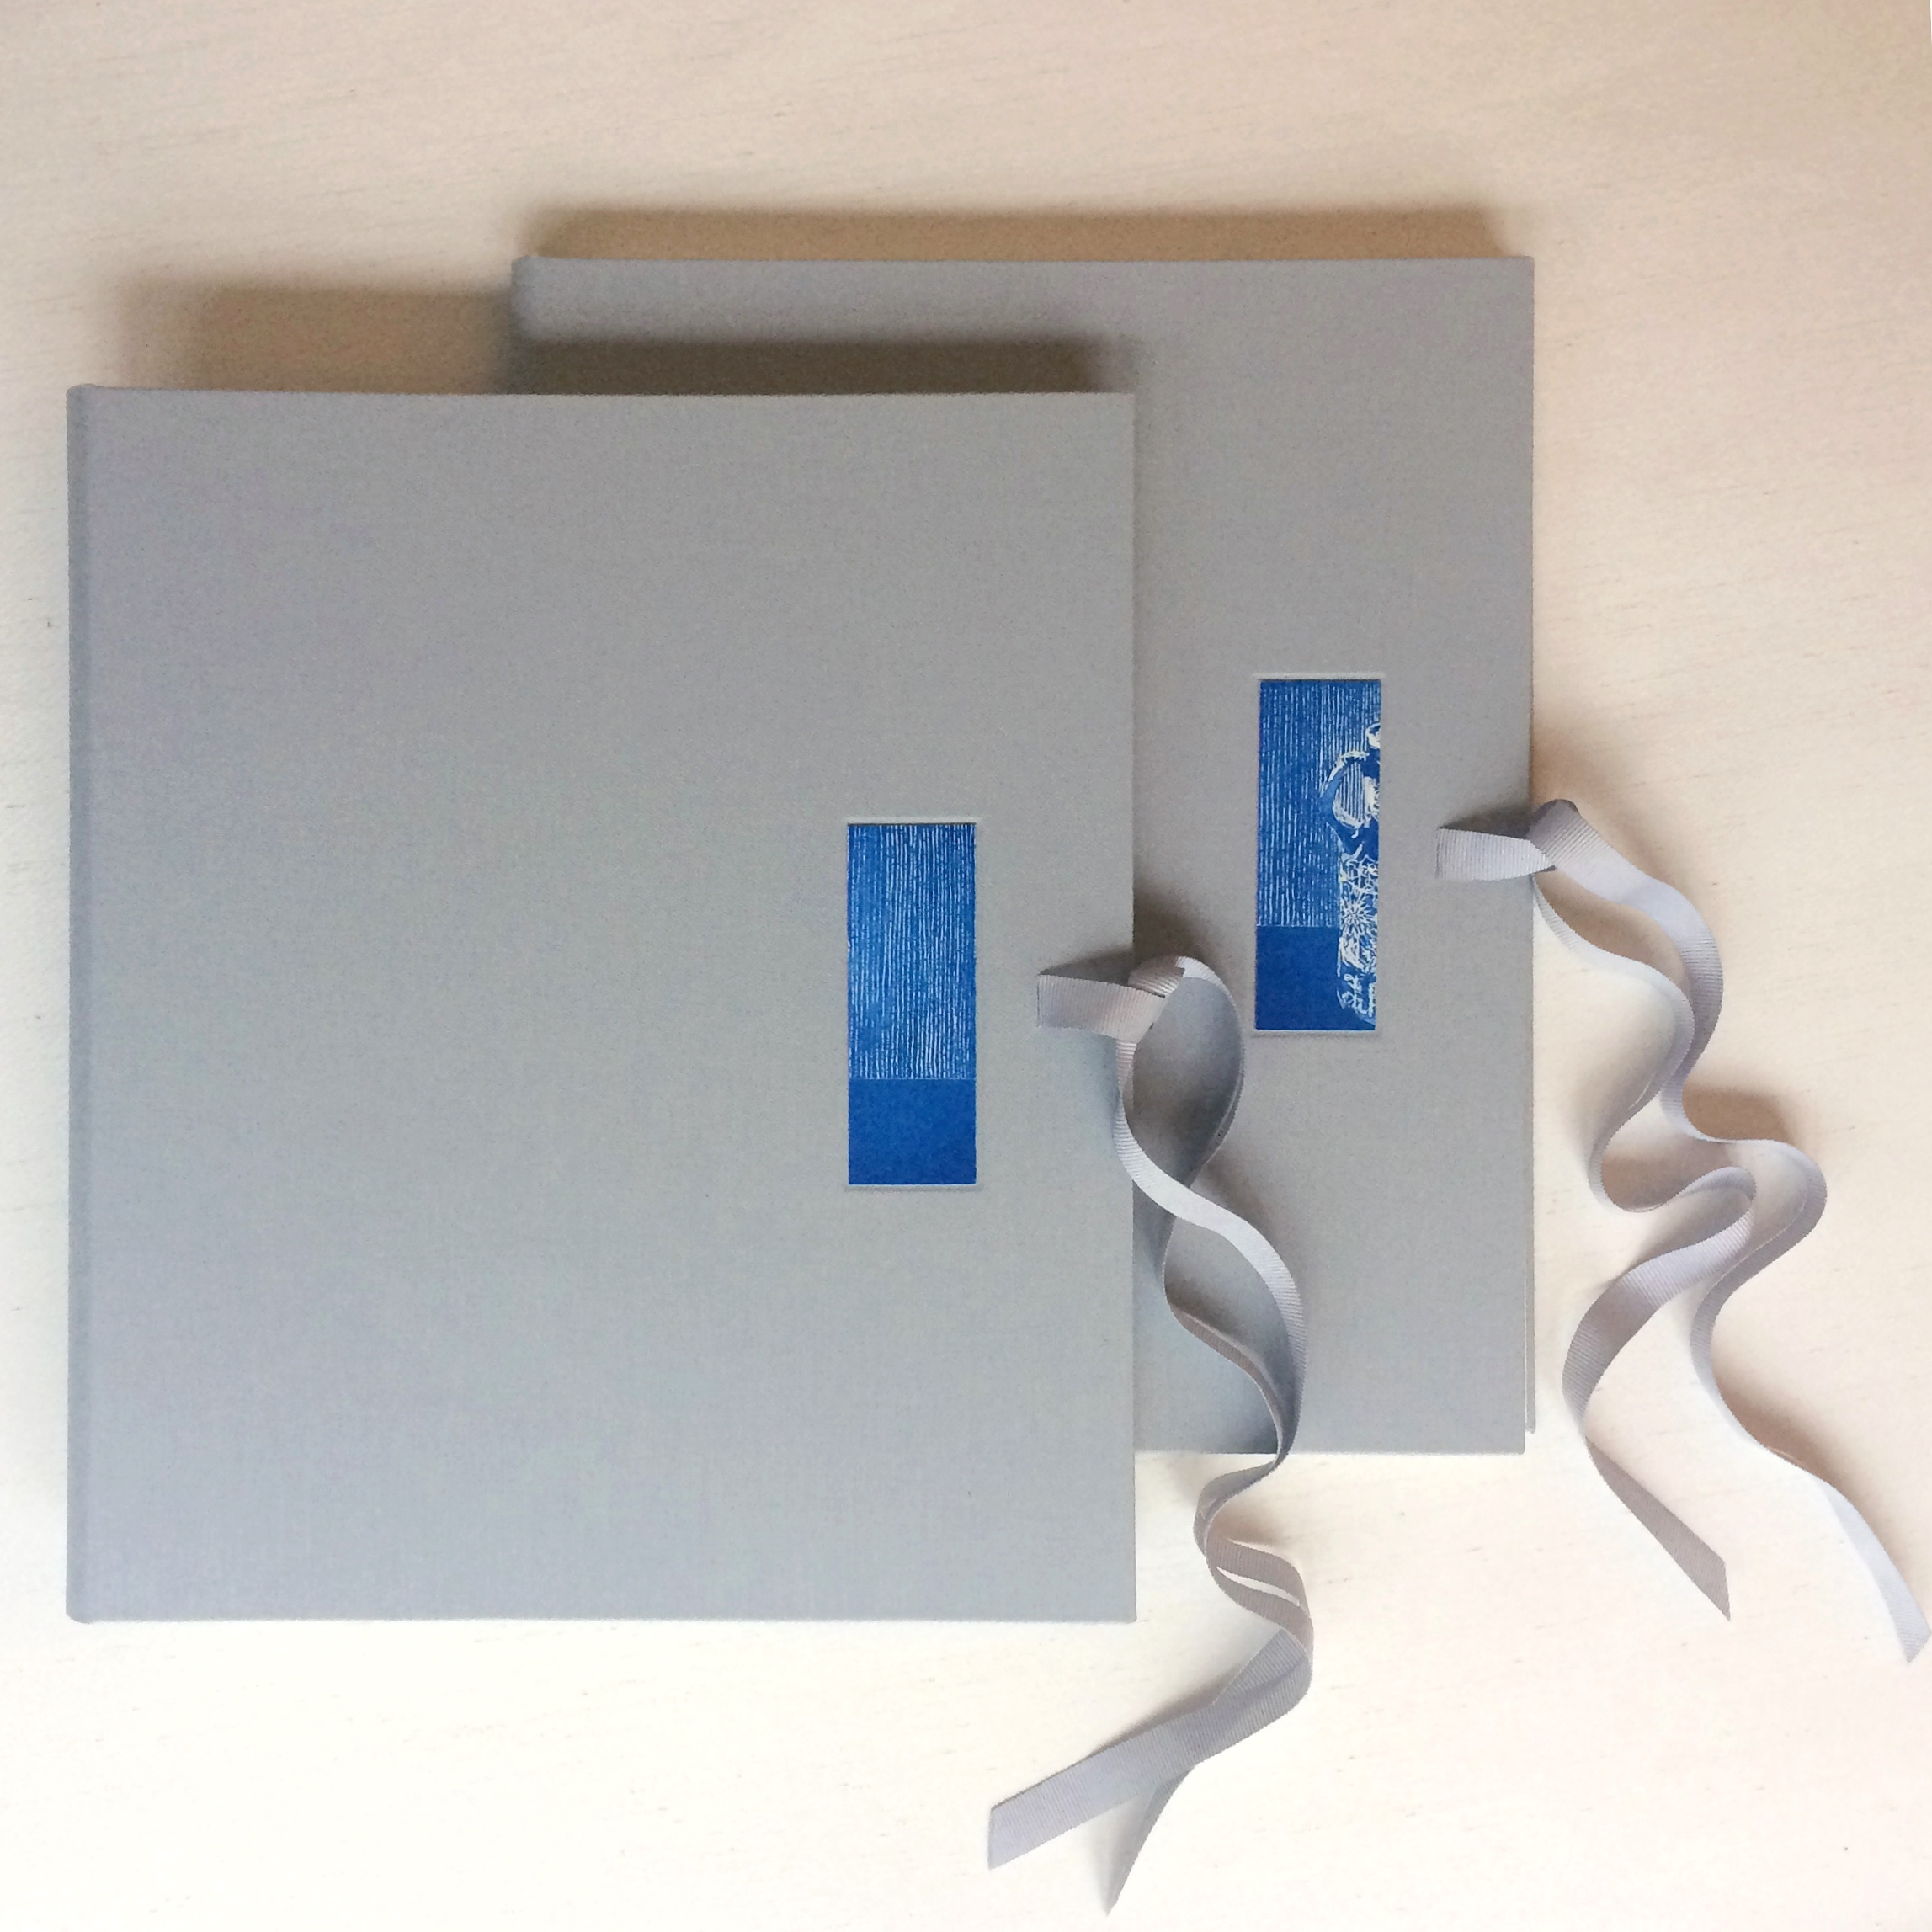 Grey cover with blue print recessed into cover of handmade portfolio